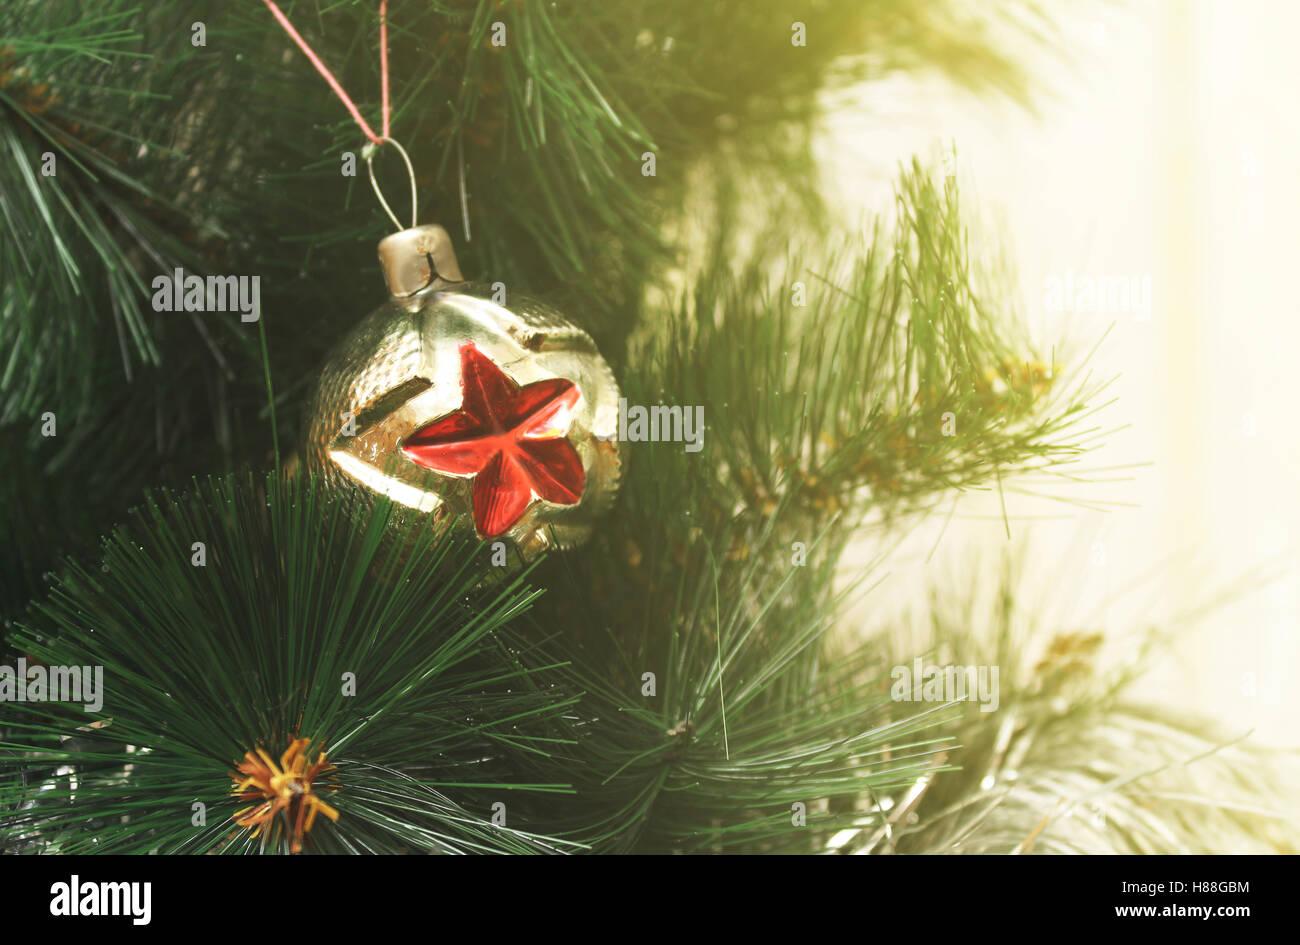 Mery Christmas Card Stockfotos & Mery Christmas Card Bilder - Alamy